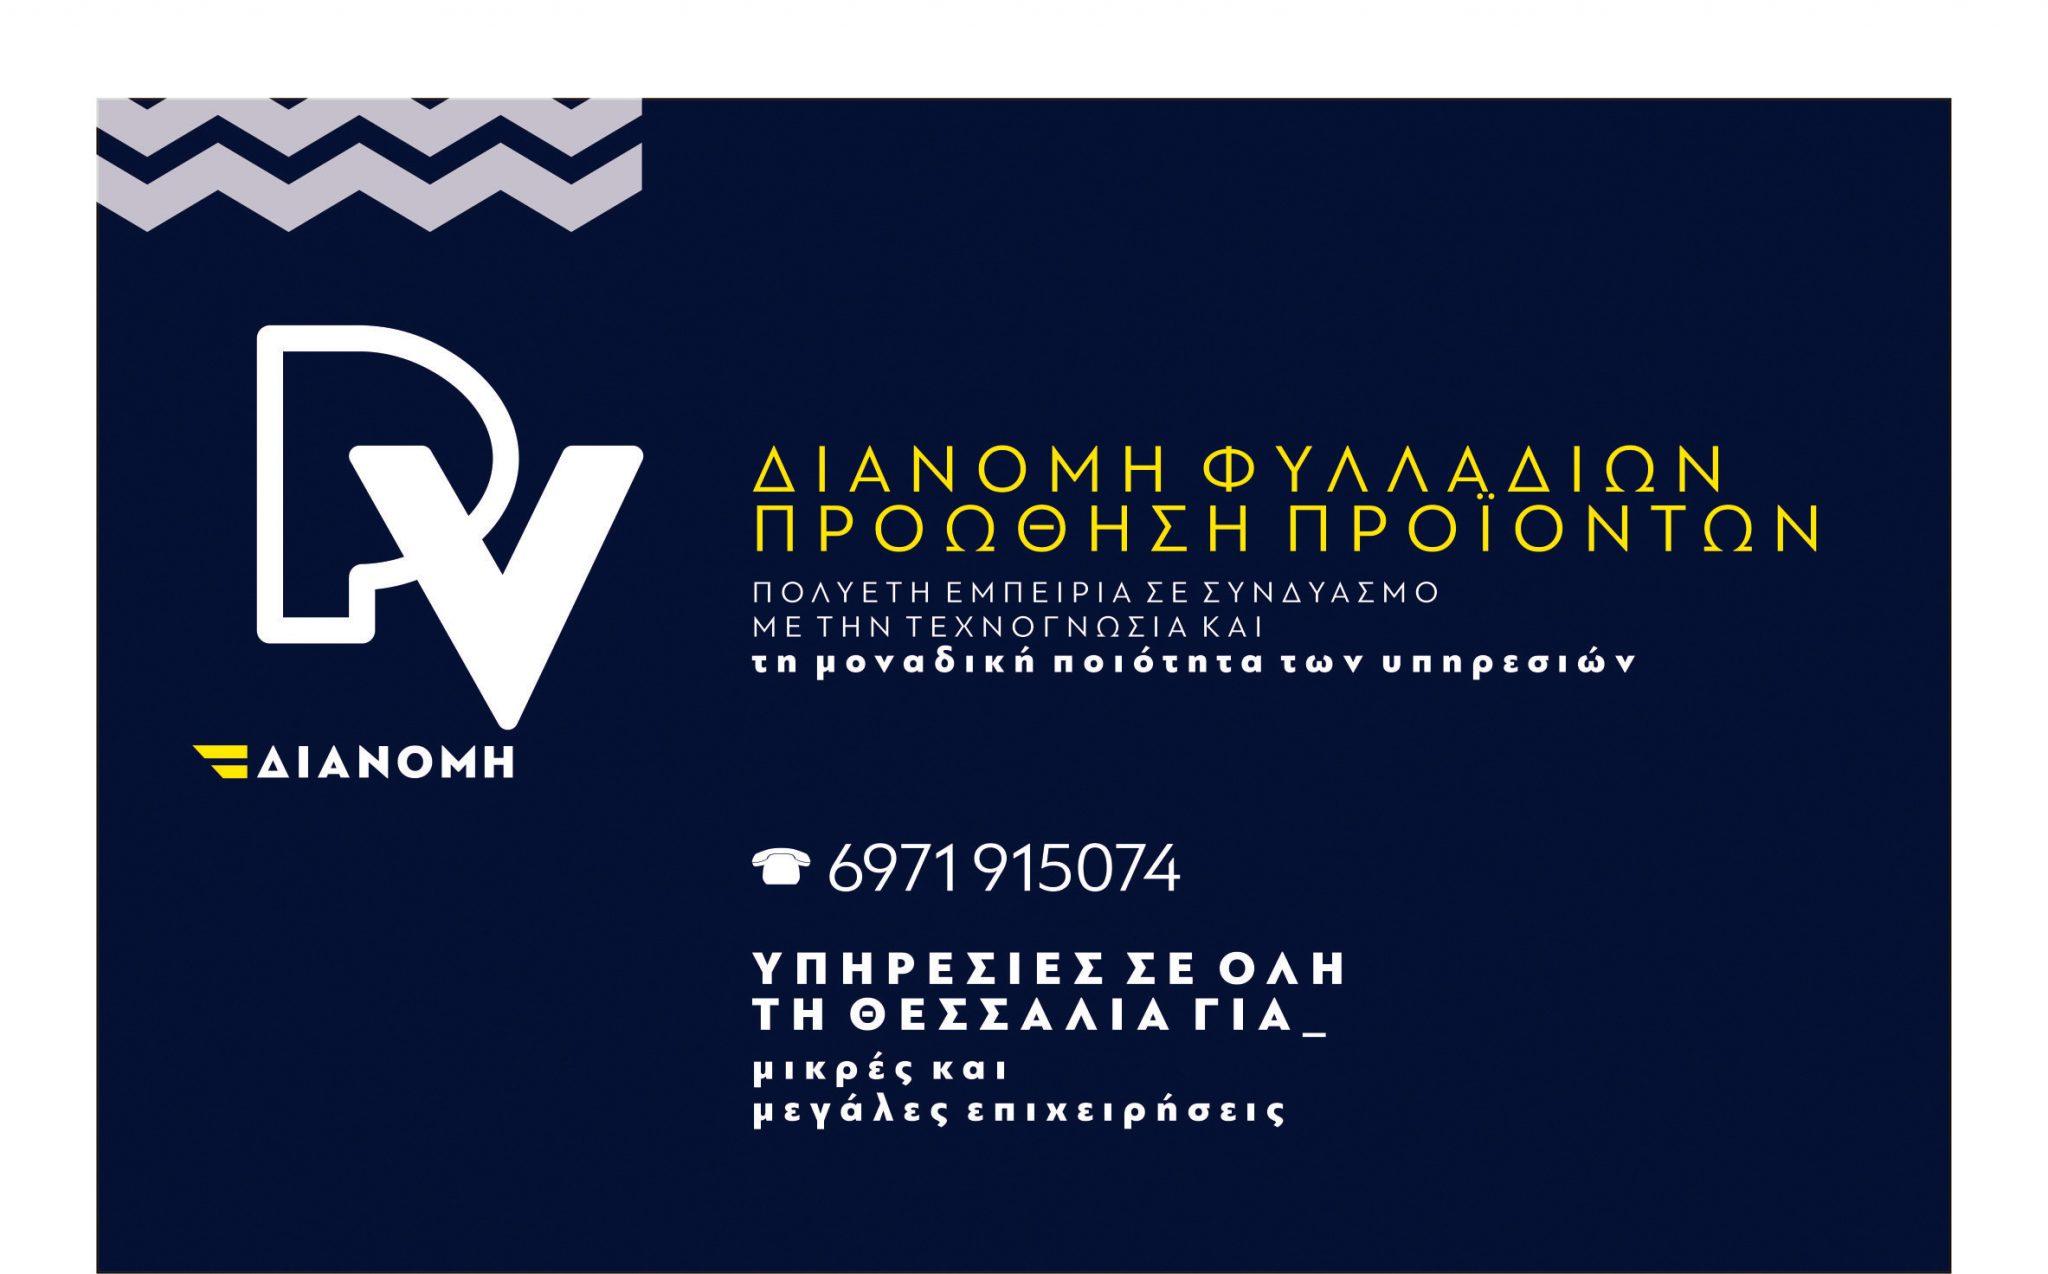 """PV ΔΙΑΝΟΜΗ"": Διανομή φυλλαδίων και προώθηση προϊόντων με συνέπεια, αξιοπιστία και επιτυχή αποτελέσματα!"